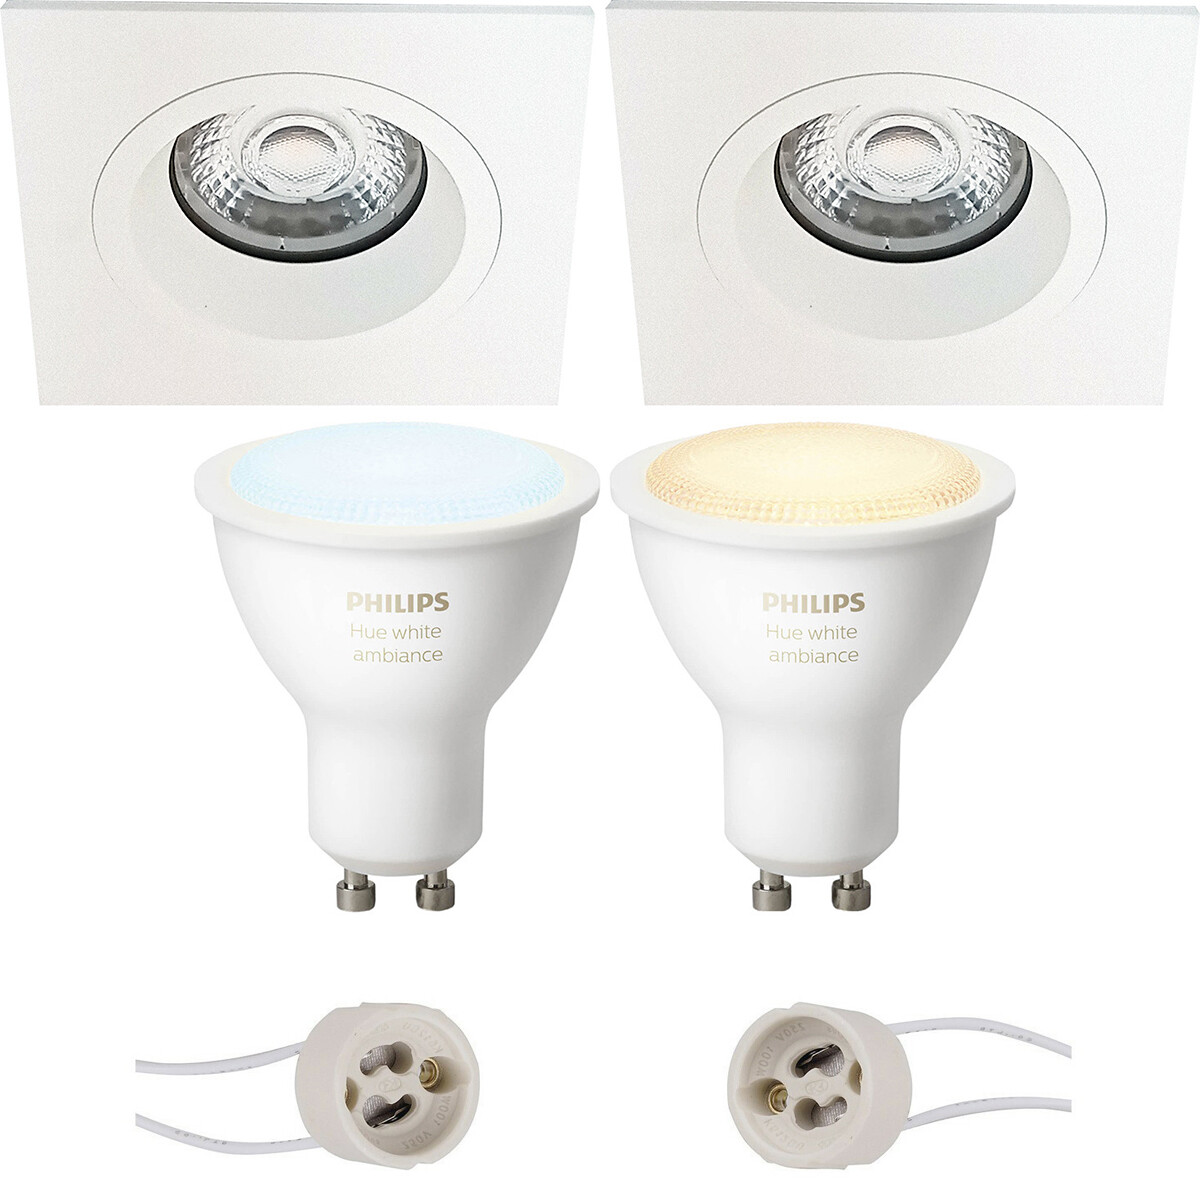 Pragmi Rodos Pro - Inbouw Vierkant - Mat Wit - 93mm - Philips Hue - LED Spot Set GU10 - White Ambian